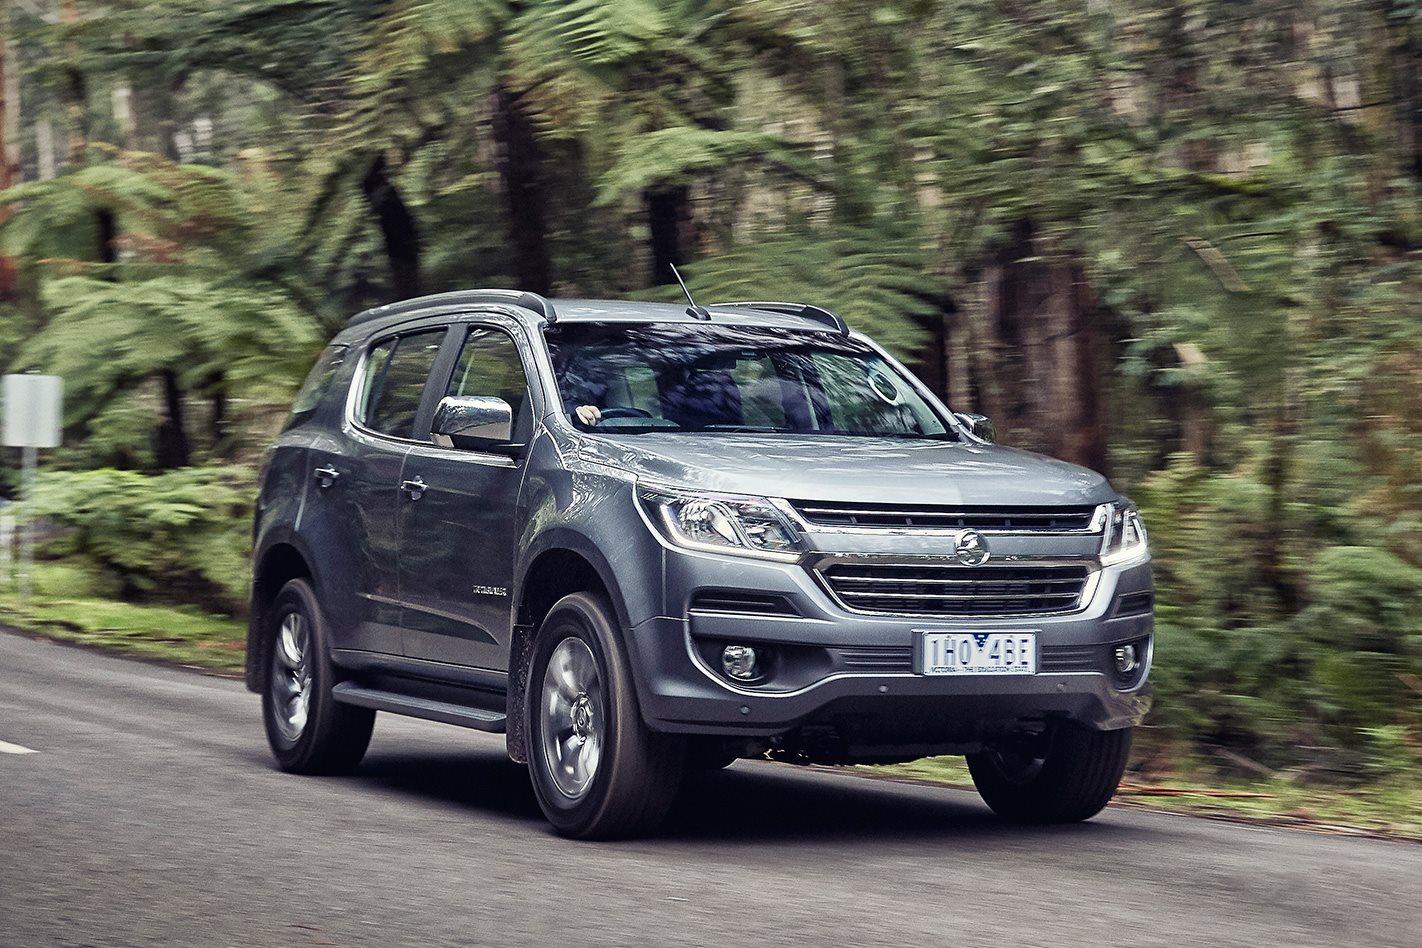 2017 Holden Trailblazer review